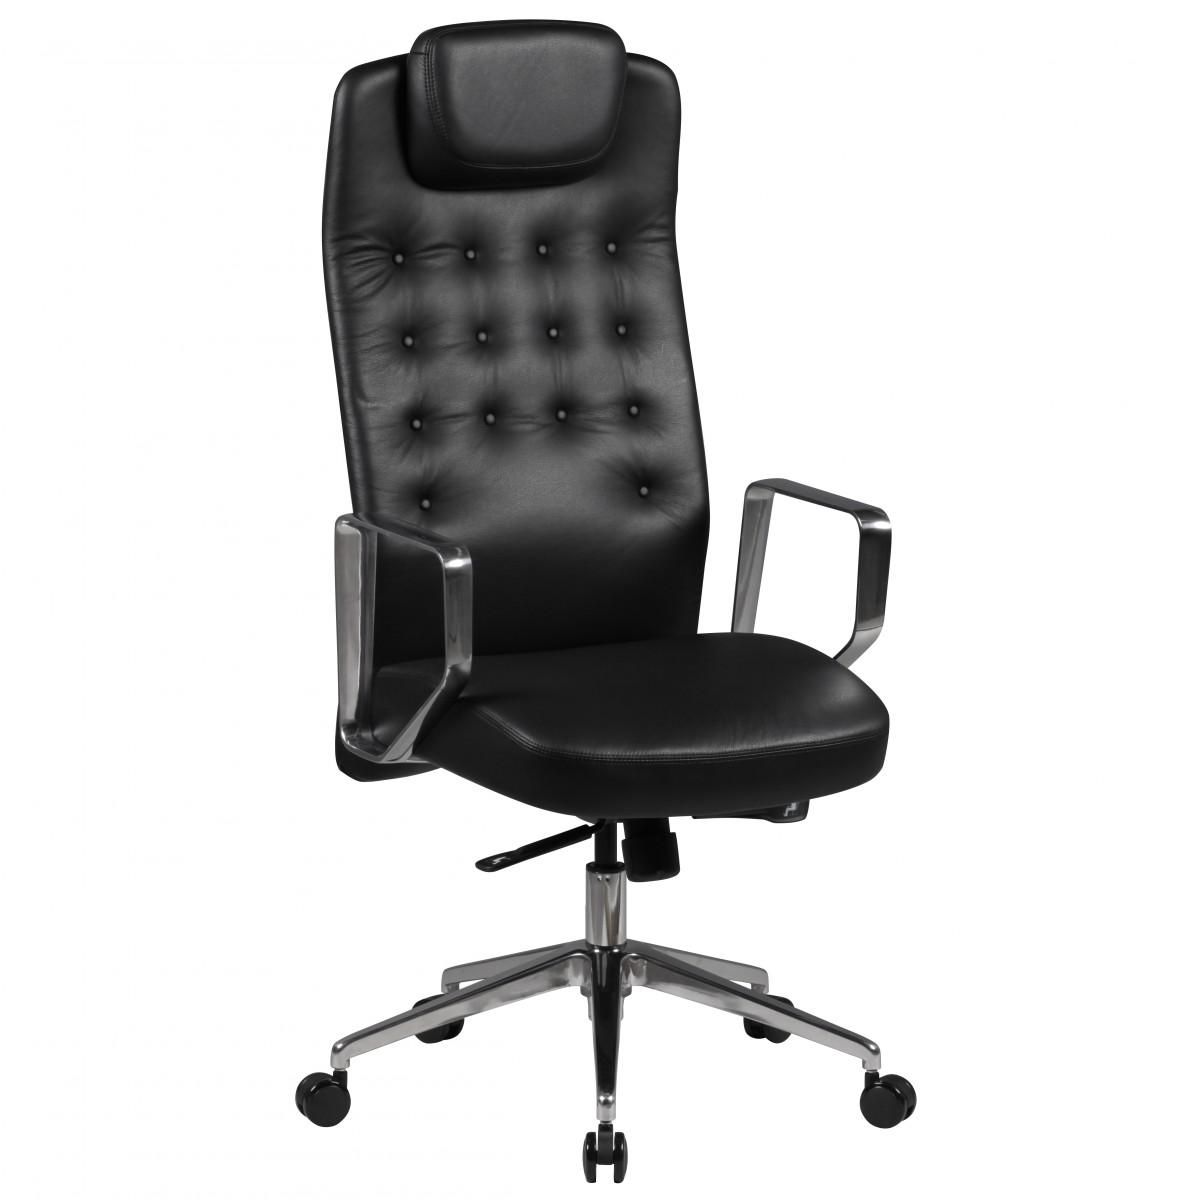 Du har 10 års garanti på din kontorstol fra Kontorstole